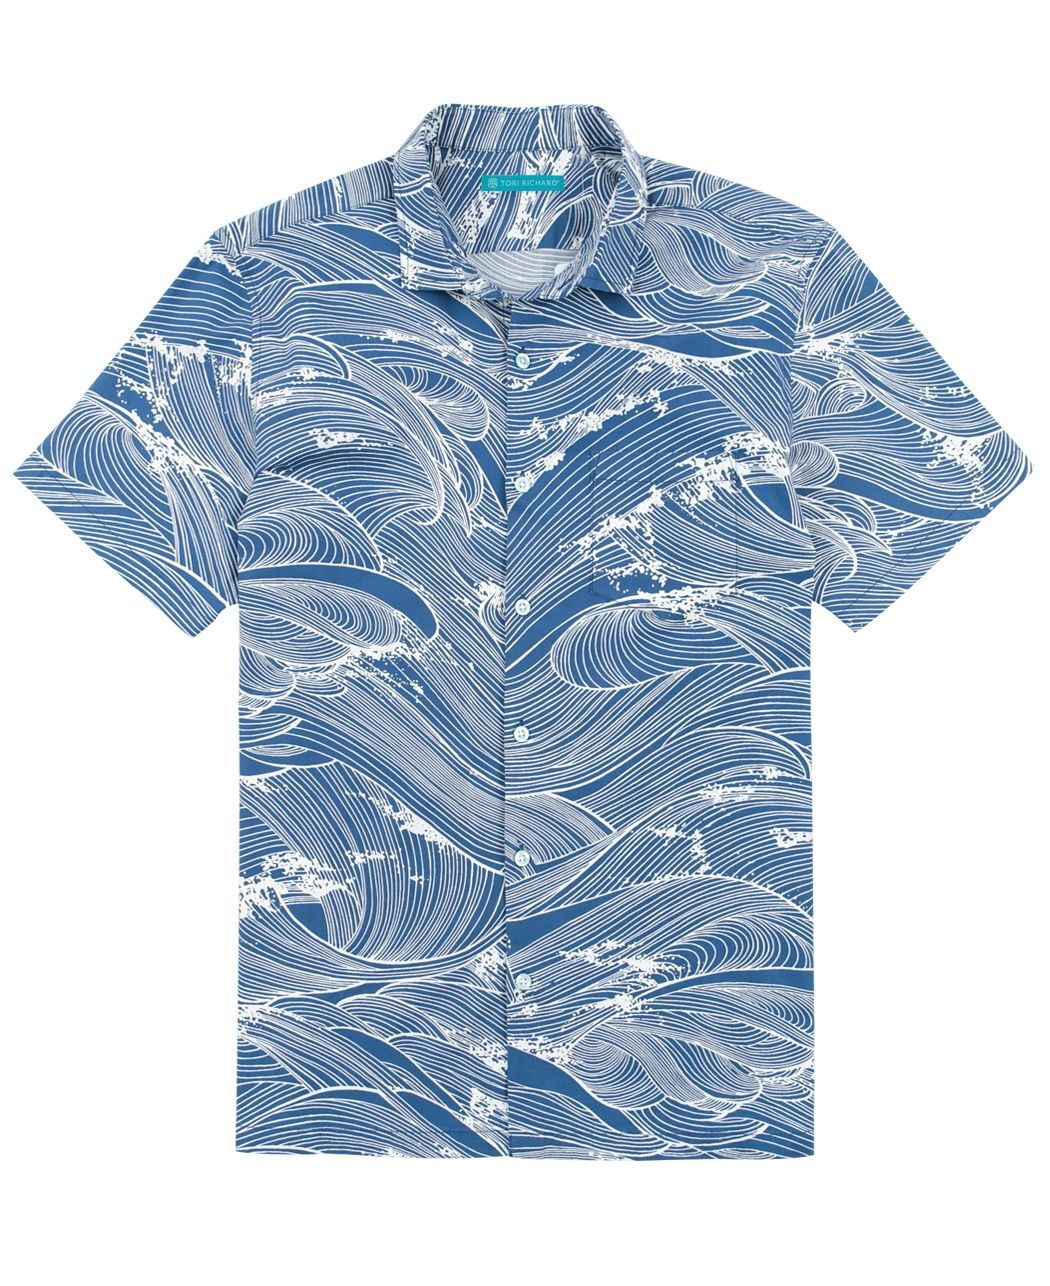 Tori Richard Ocean Hawaiian Shirt